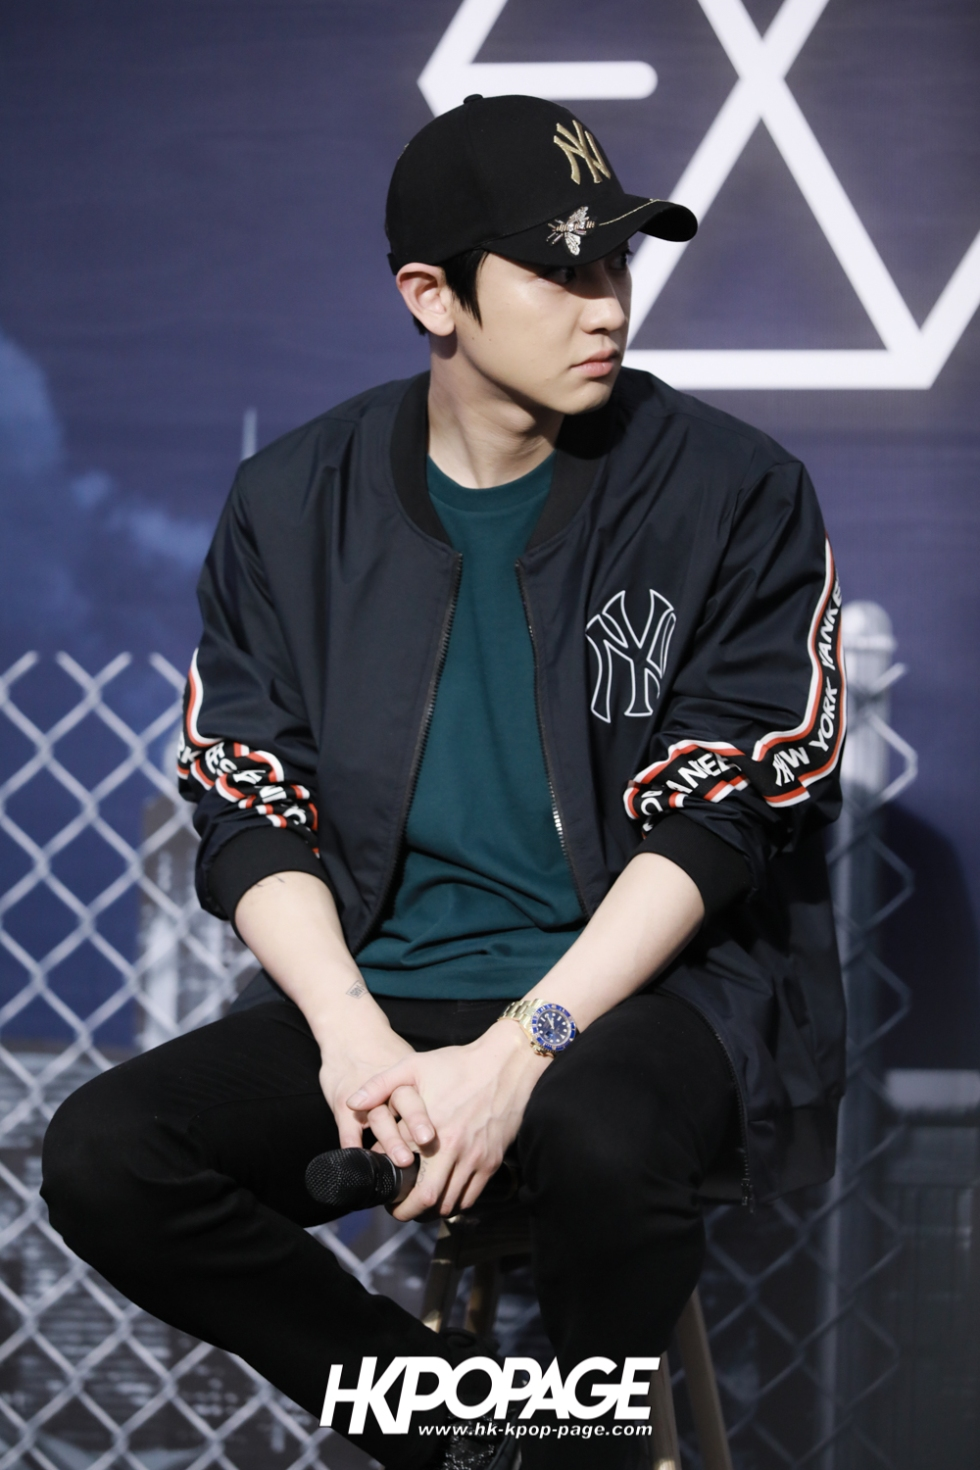 [HK.KPOP.PAGE] 180323_EXO_Chanyeol Kai Sehun_MLB Event_11